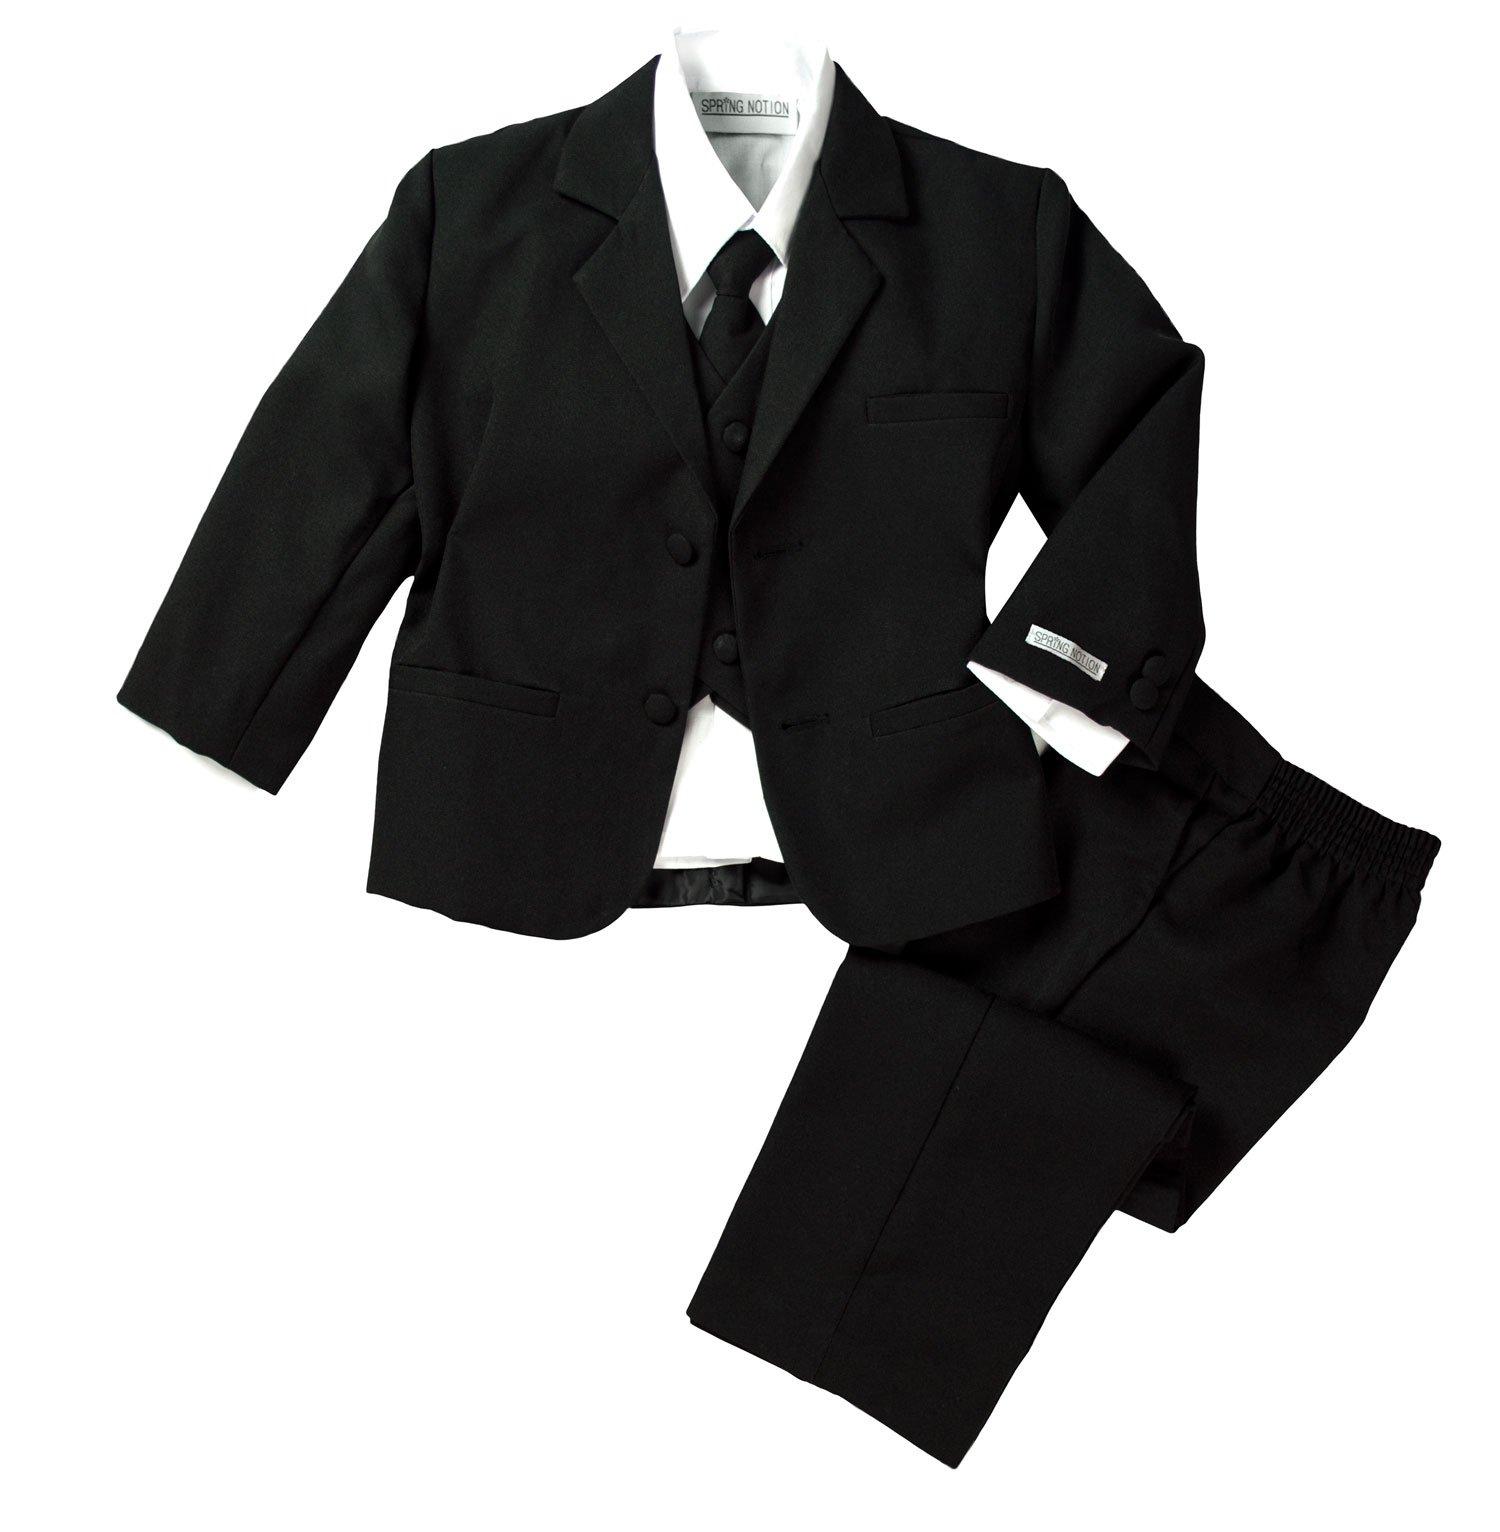 Spring Notion Baby Boys' Formal Black Dress Suit Set 9M